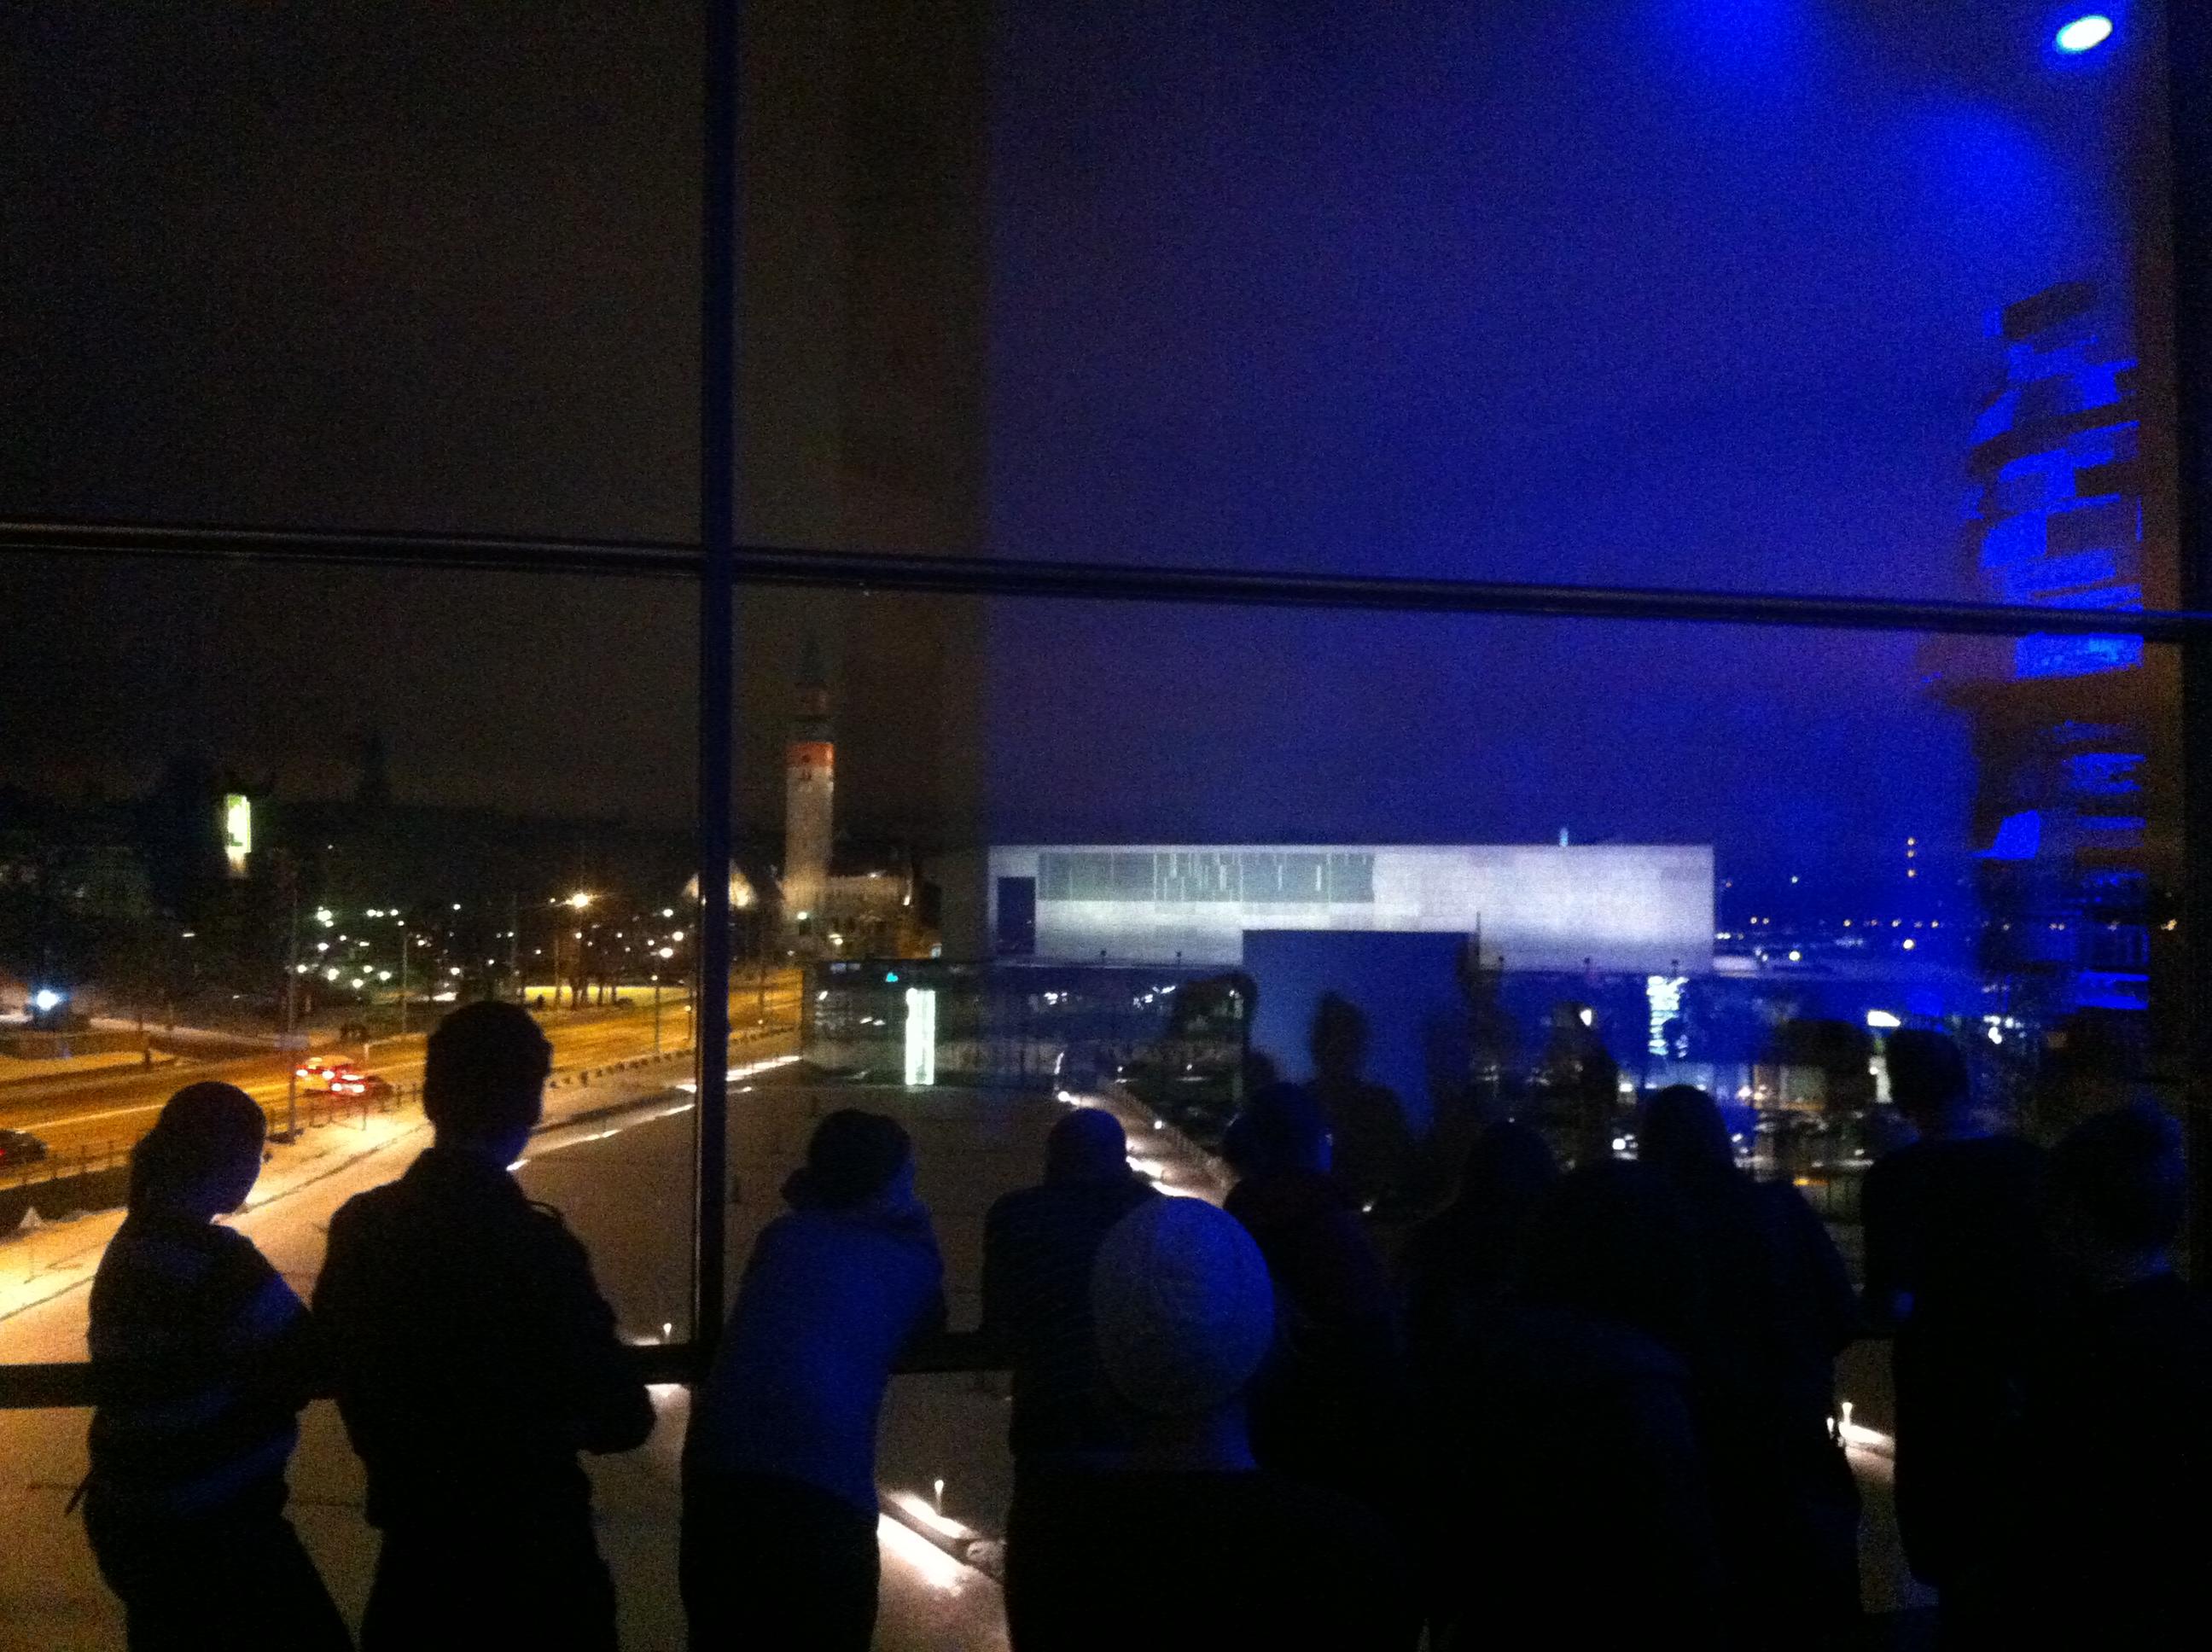 Midnight in Kiasma. Image Susanna Ånäs. CC-BY 3.0